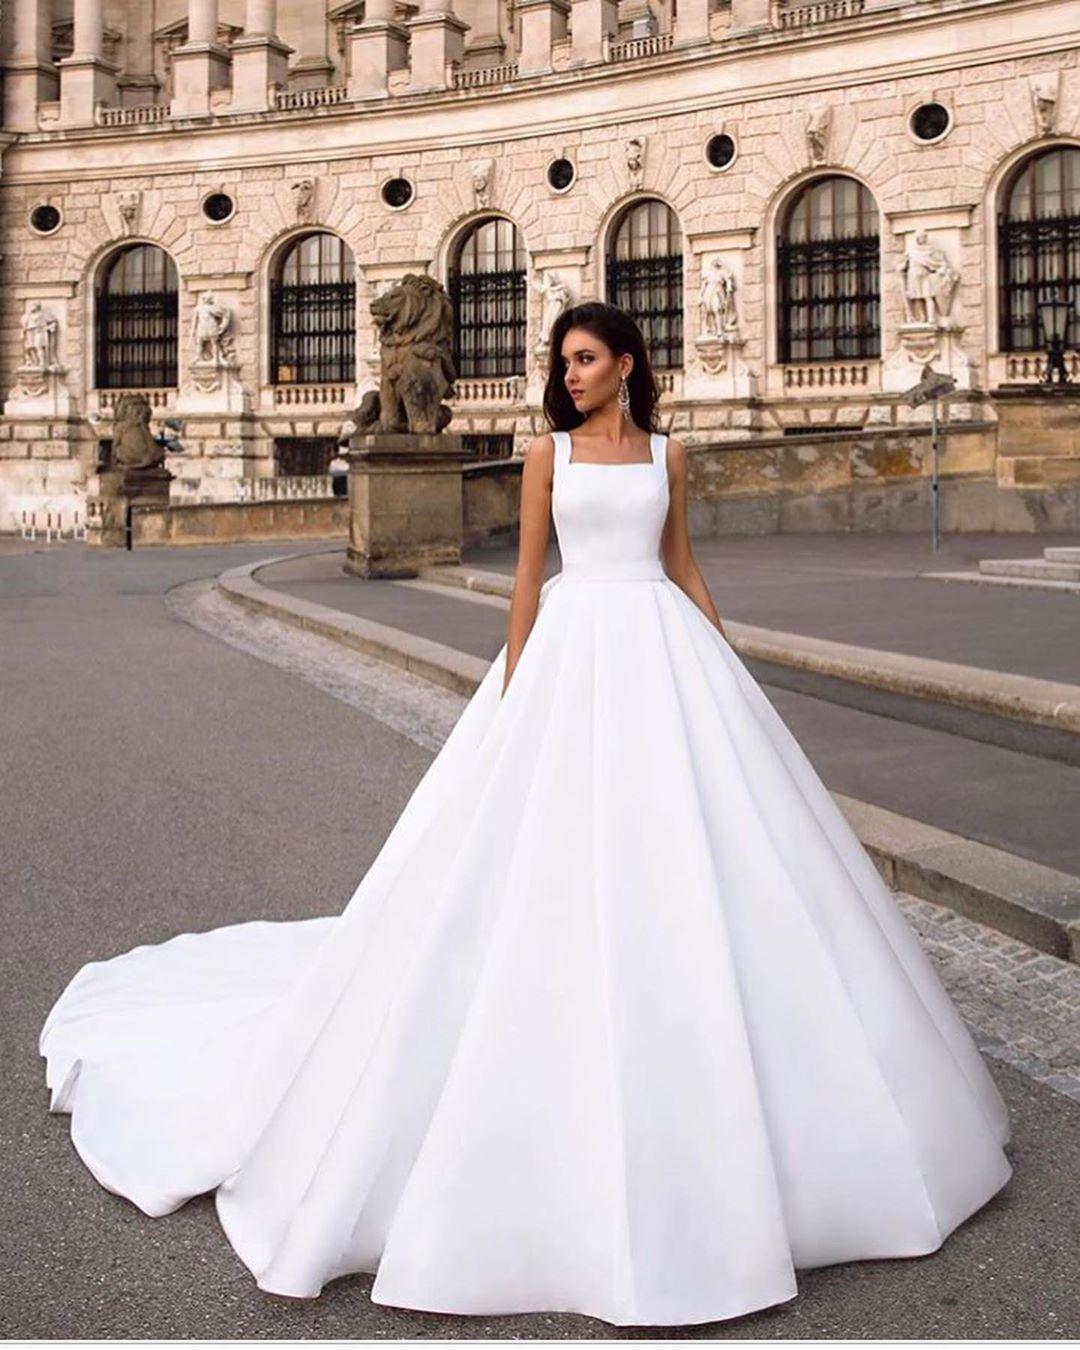 Vintage White Wedding Dress Simple Summer Plus Size Satin Cheap Long Train Square Neck Women Bridal Gowns Wedding Dresses Aliexpress